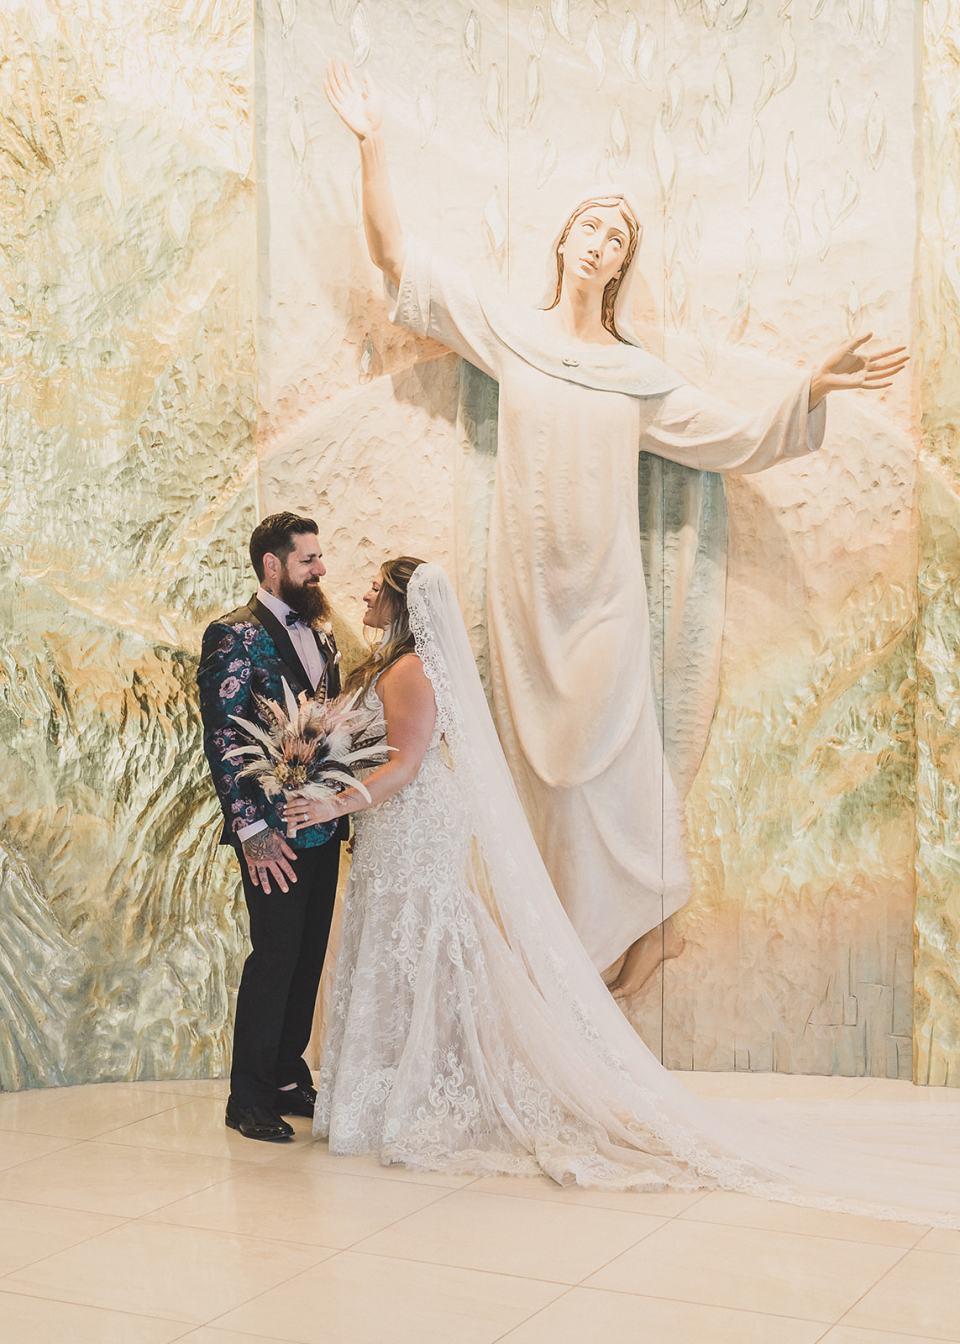 newlyweds pose by mural in Holy Spirit Roman Catholic Church